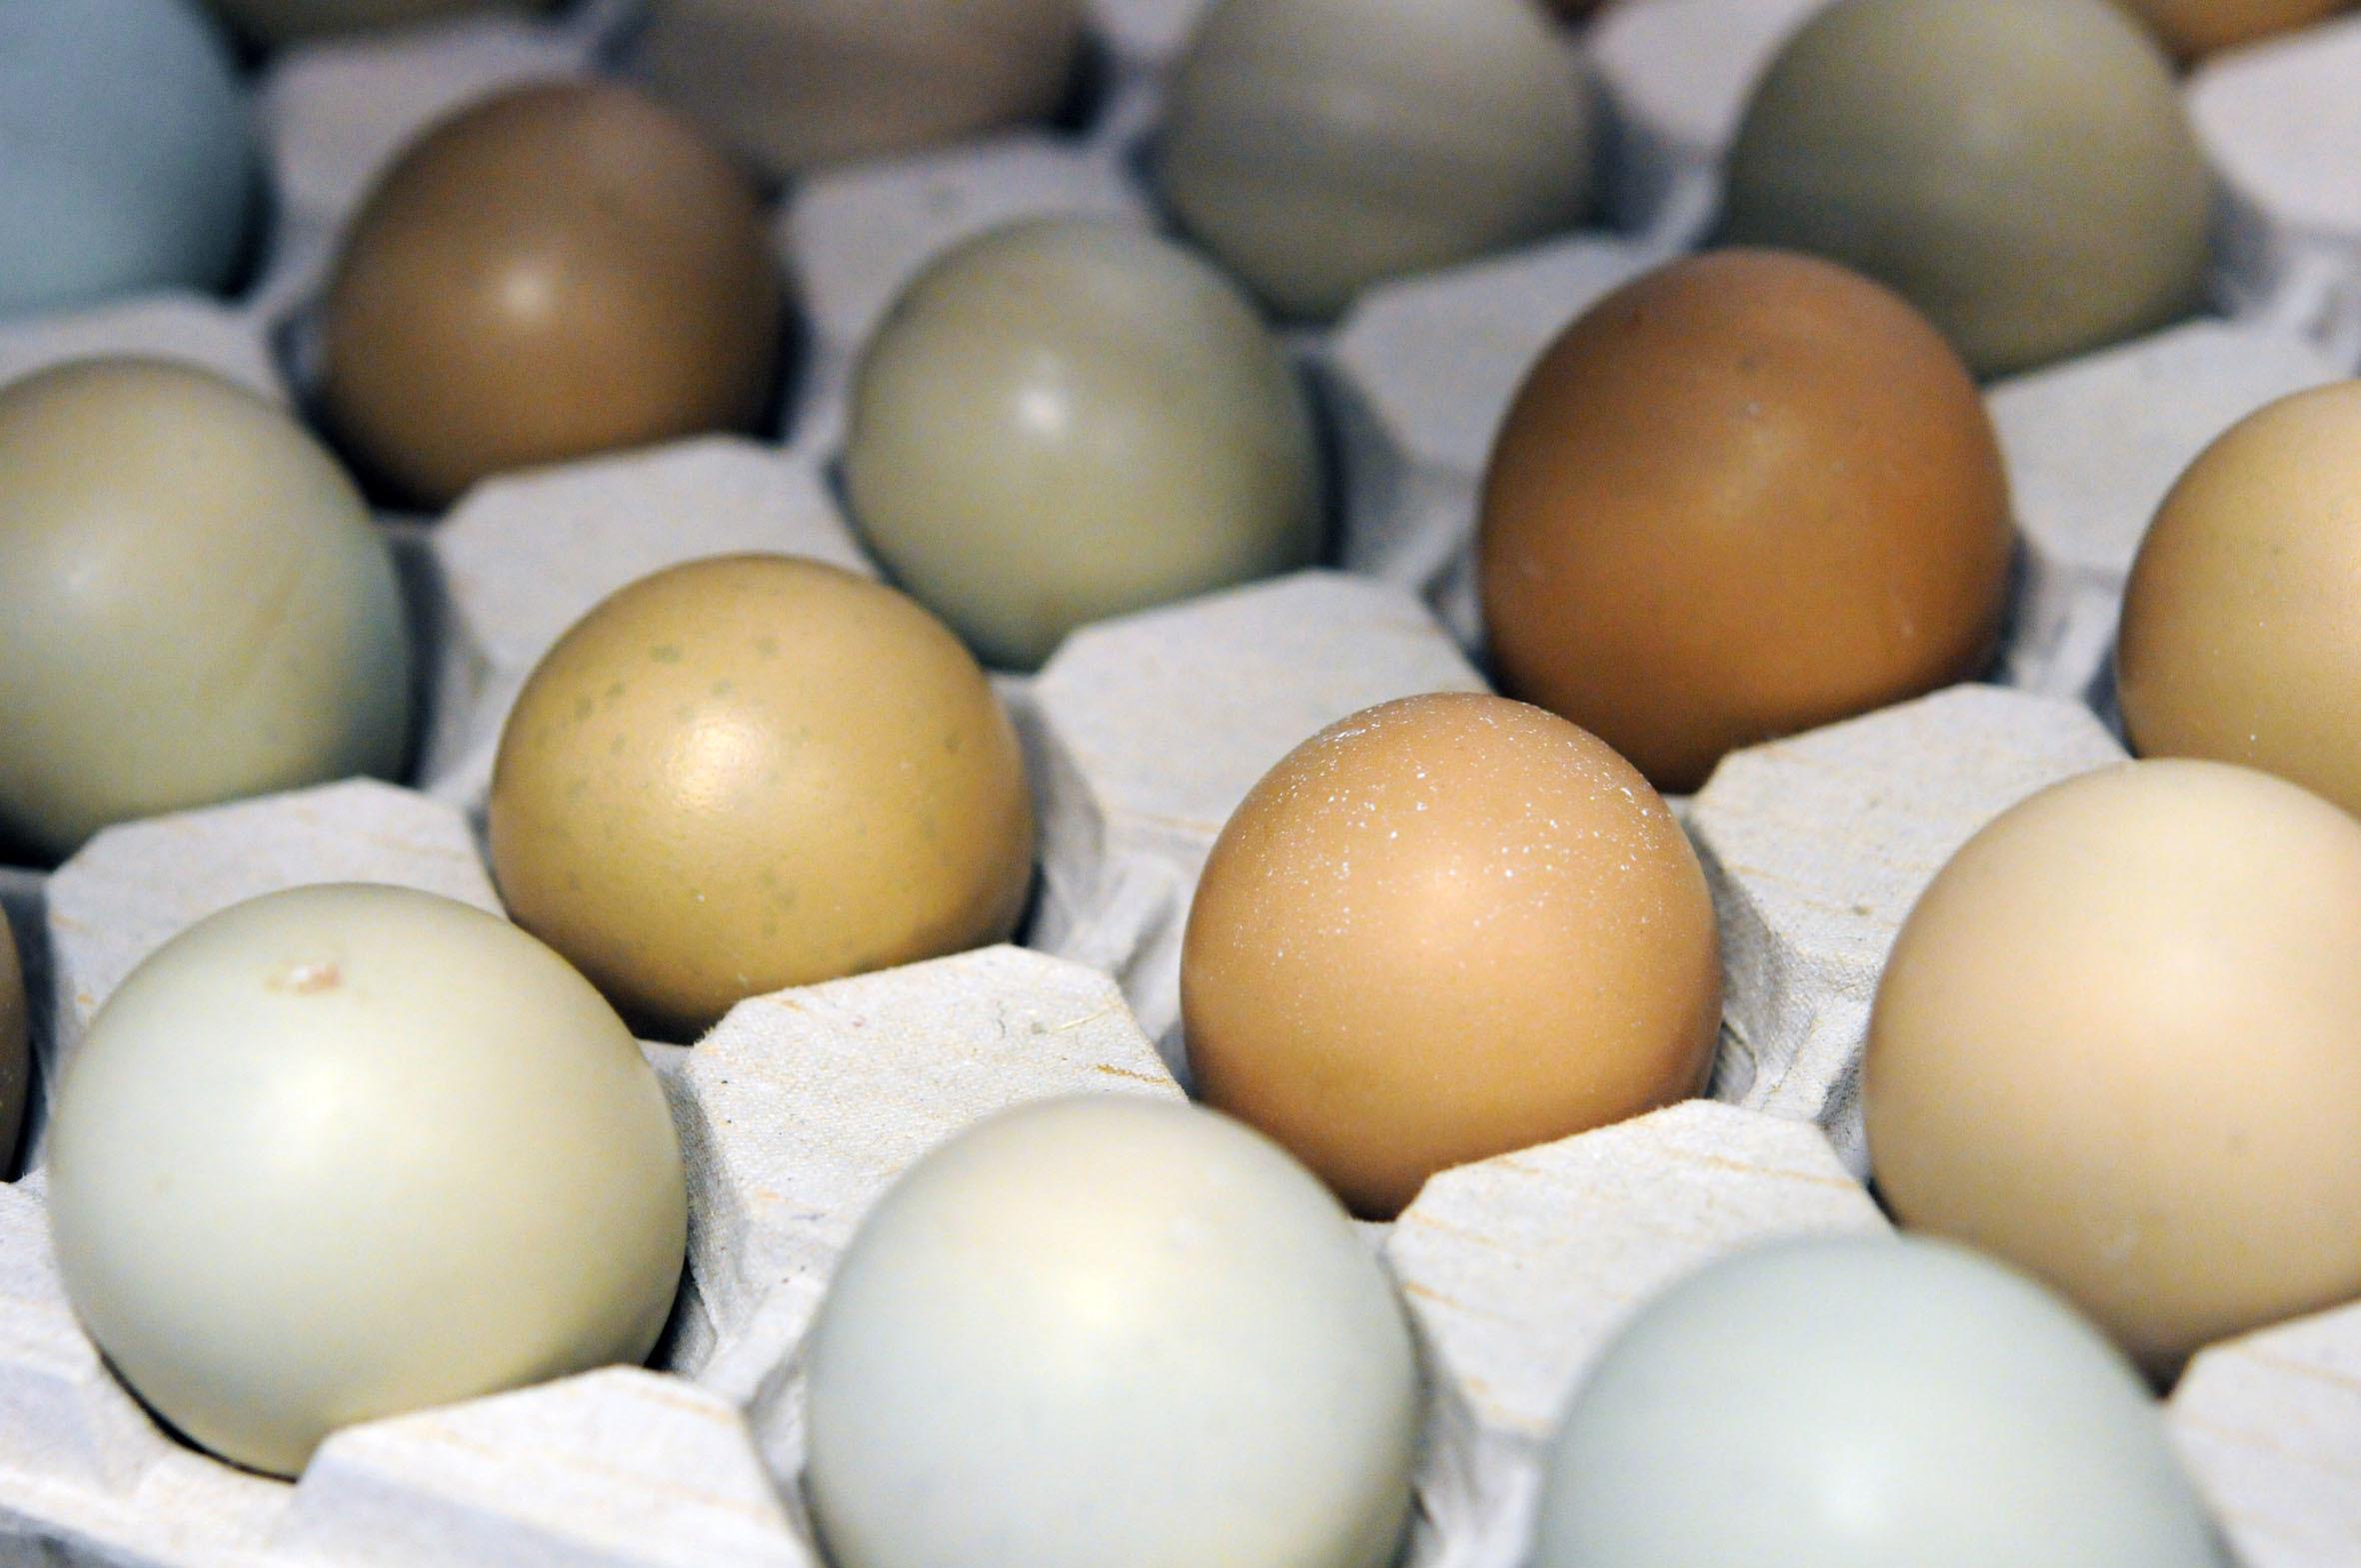 pheasant-eggs.jpg?mtime=20170922135449#asset:11467